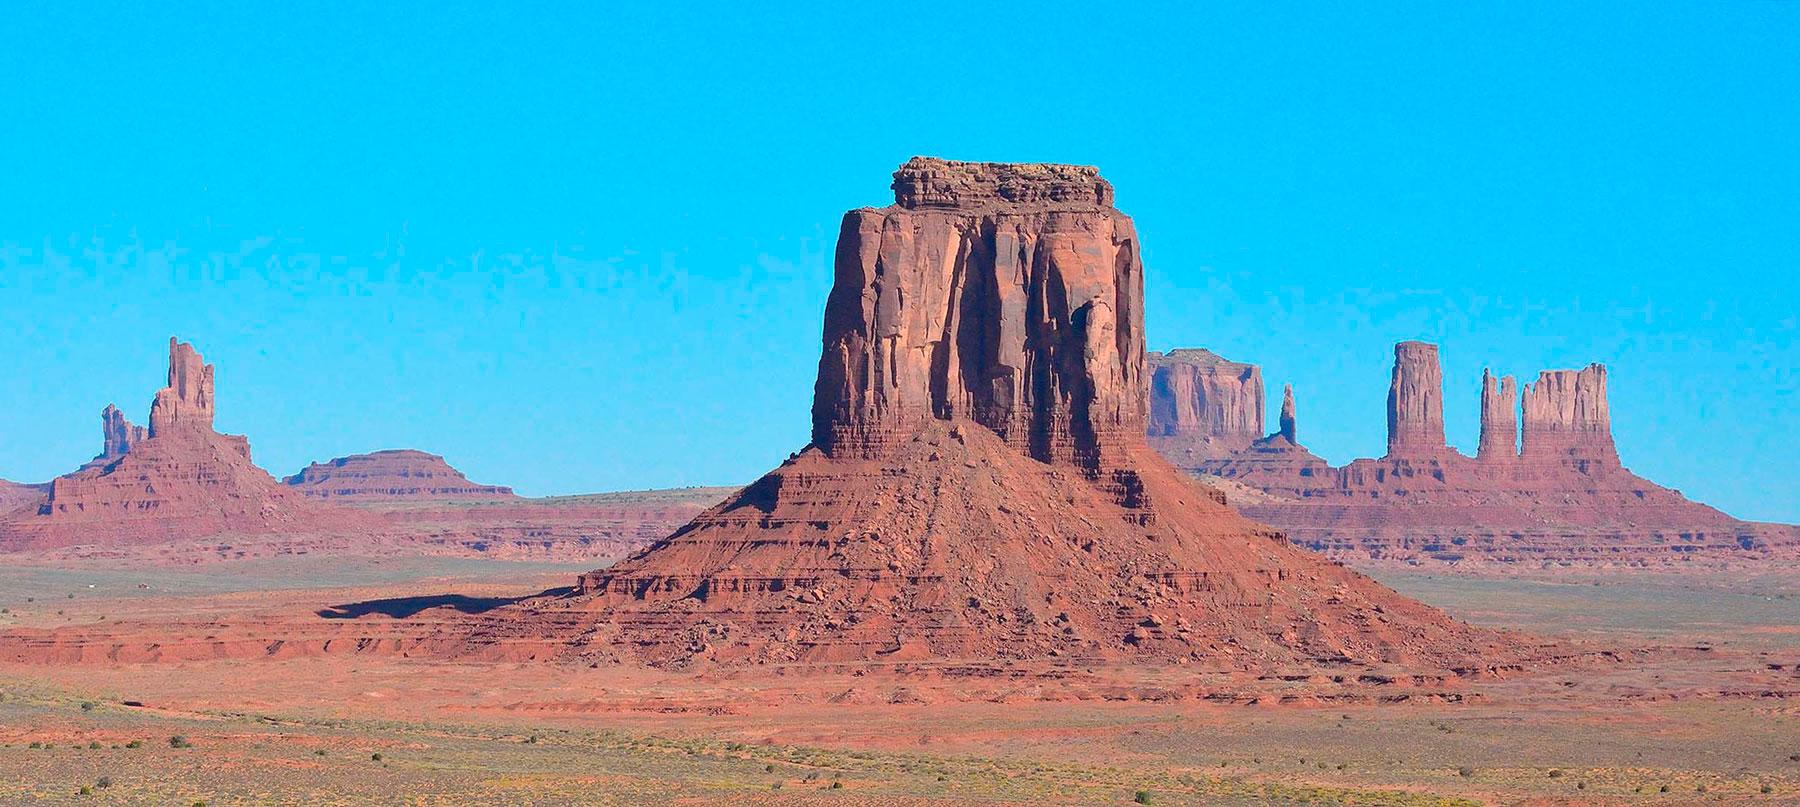 Monument-Valley-Artist-Point